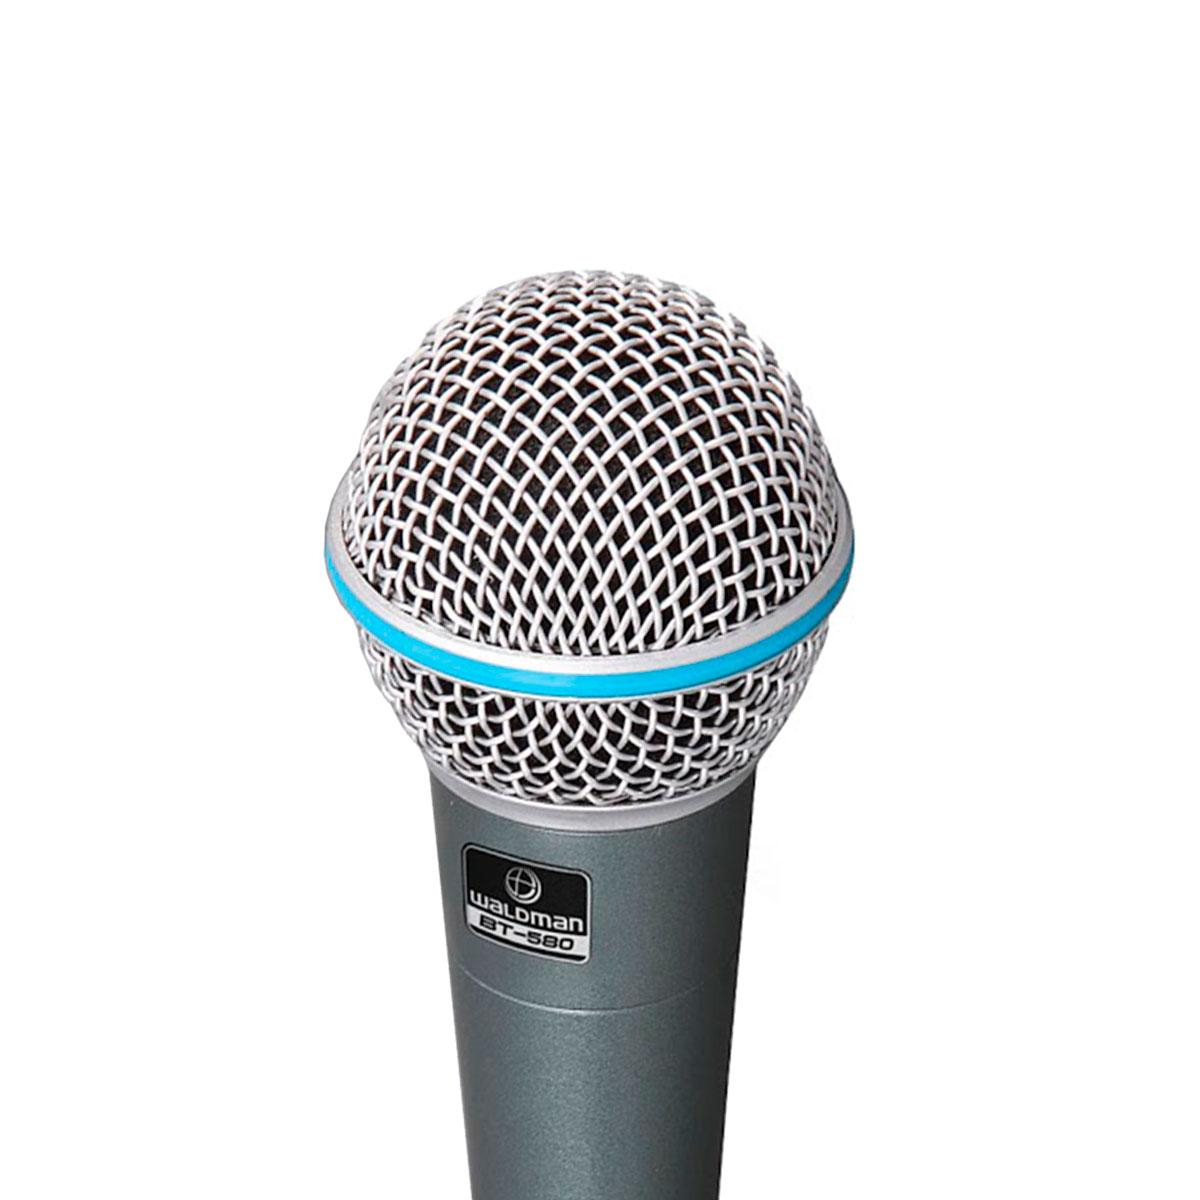 BT5803P - Kit 3 Microfones c/ Fio de Mão BT 580 3P - Waldman